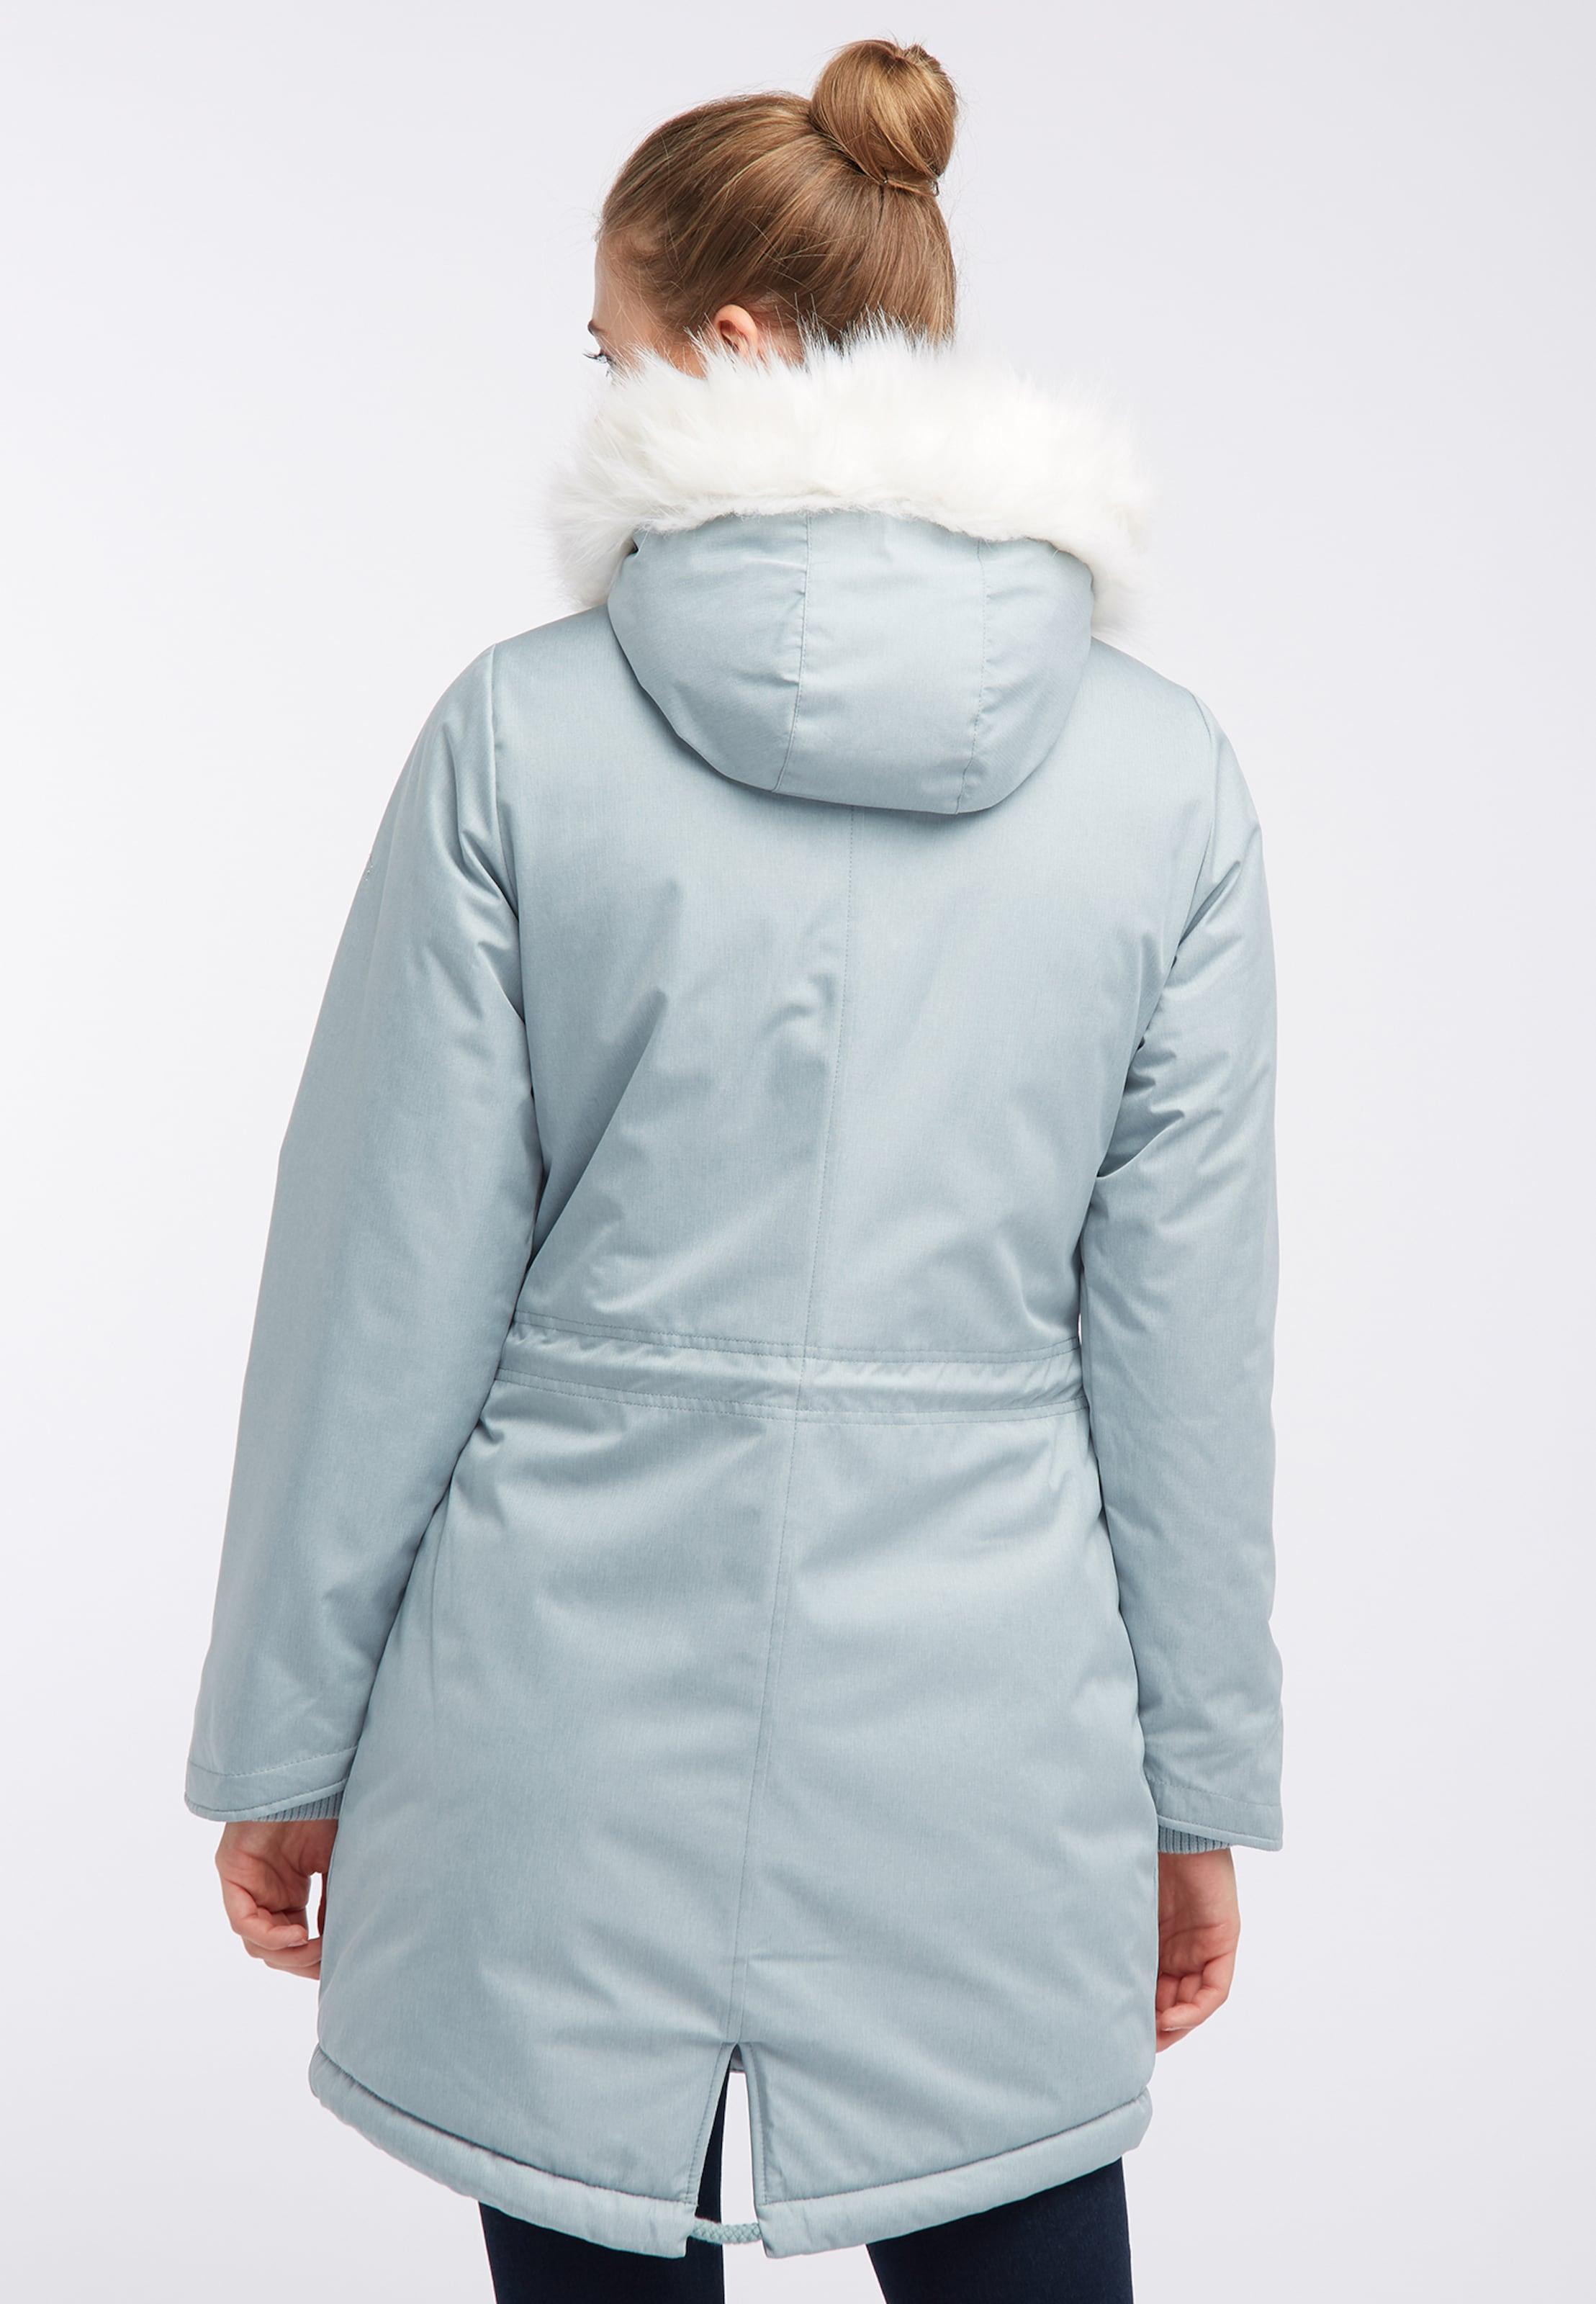 En Icebound Veste Bleu D'hiver Fumé nwkXN80OPZ